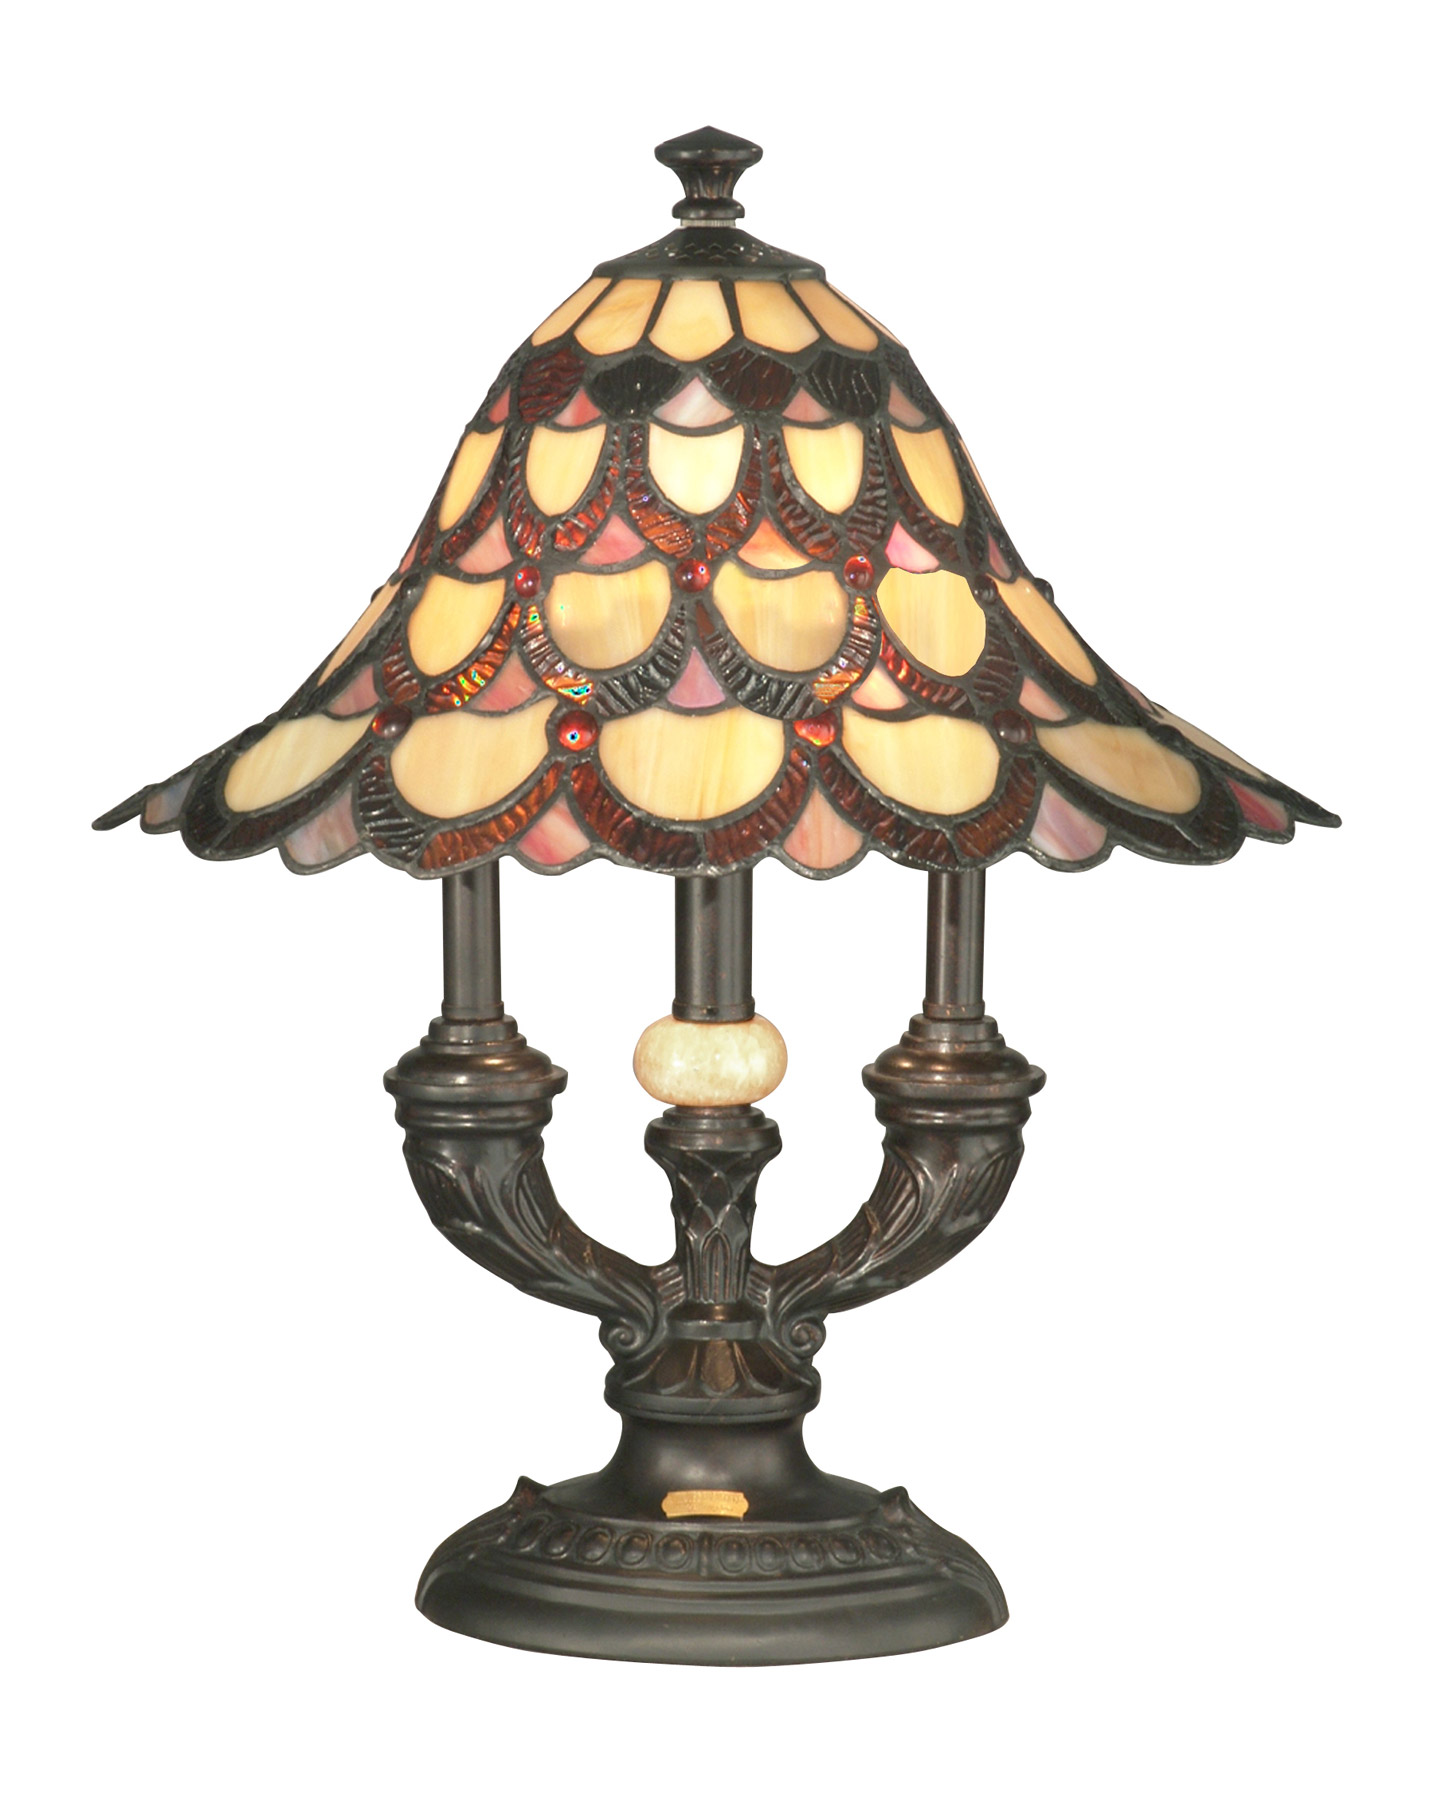 Dale Tiffany Ta70112 Tiffany Peacock Accent Lamp